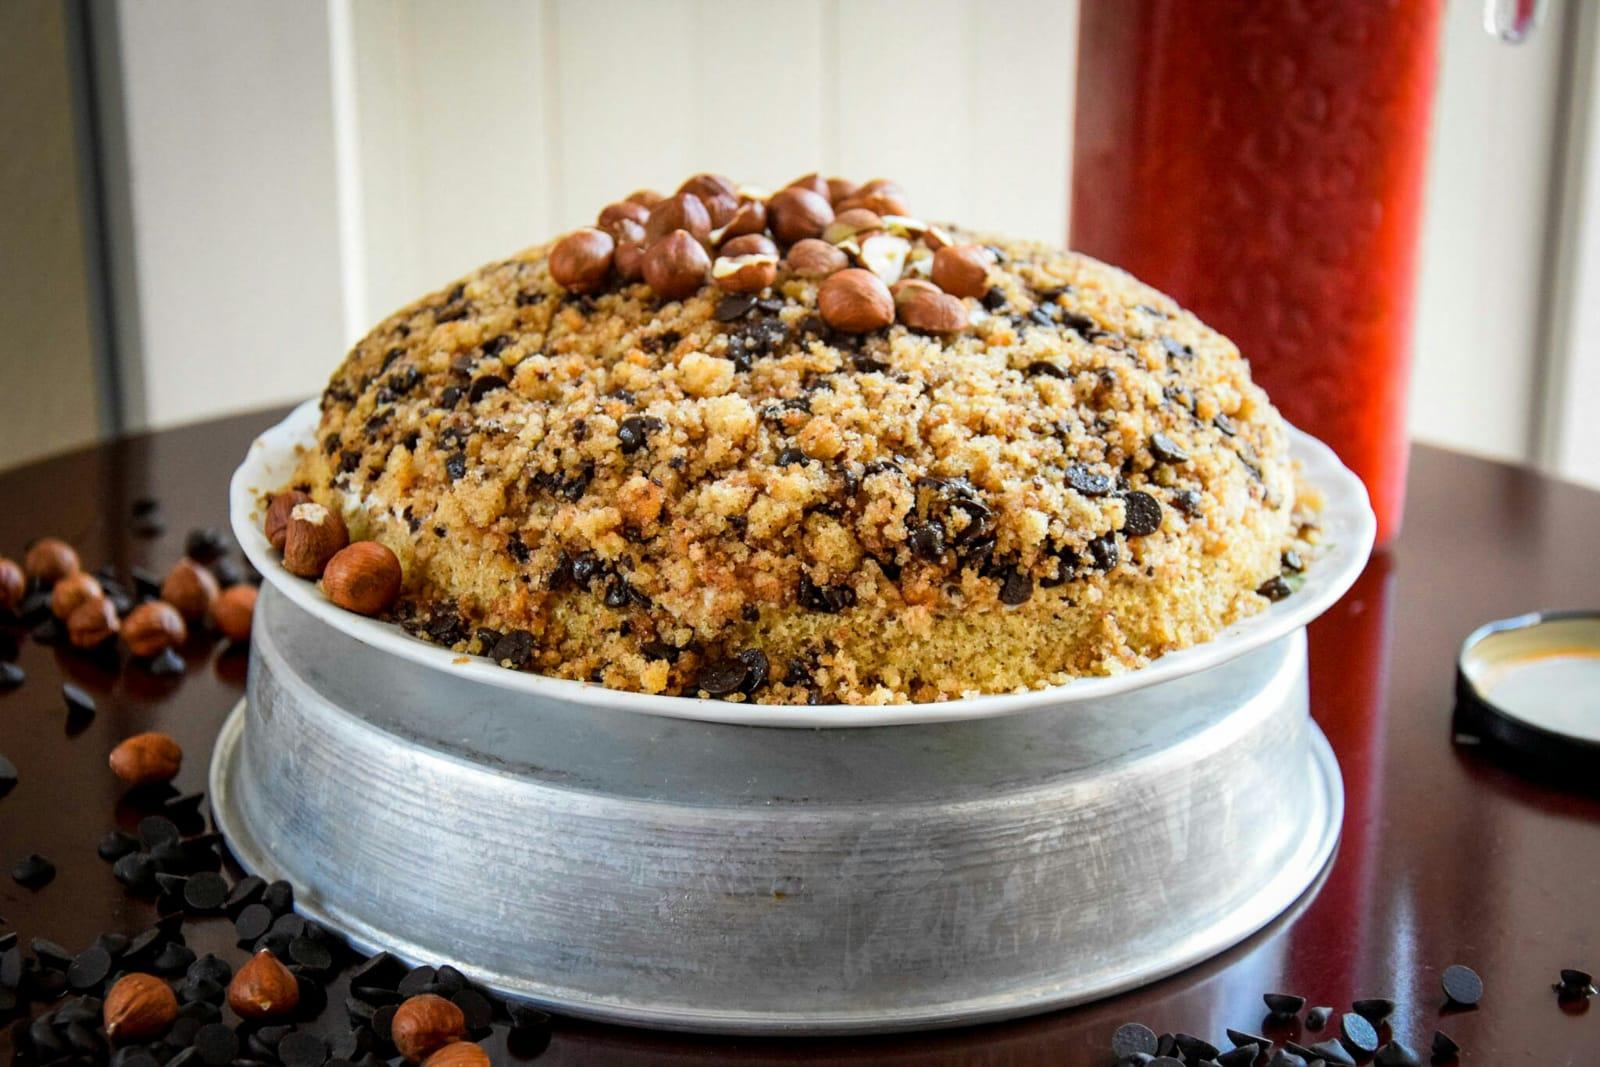 Kiras Bakery Schoko Nuss Kuchen